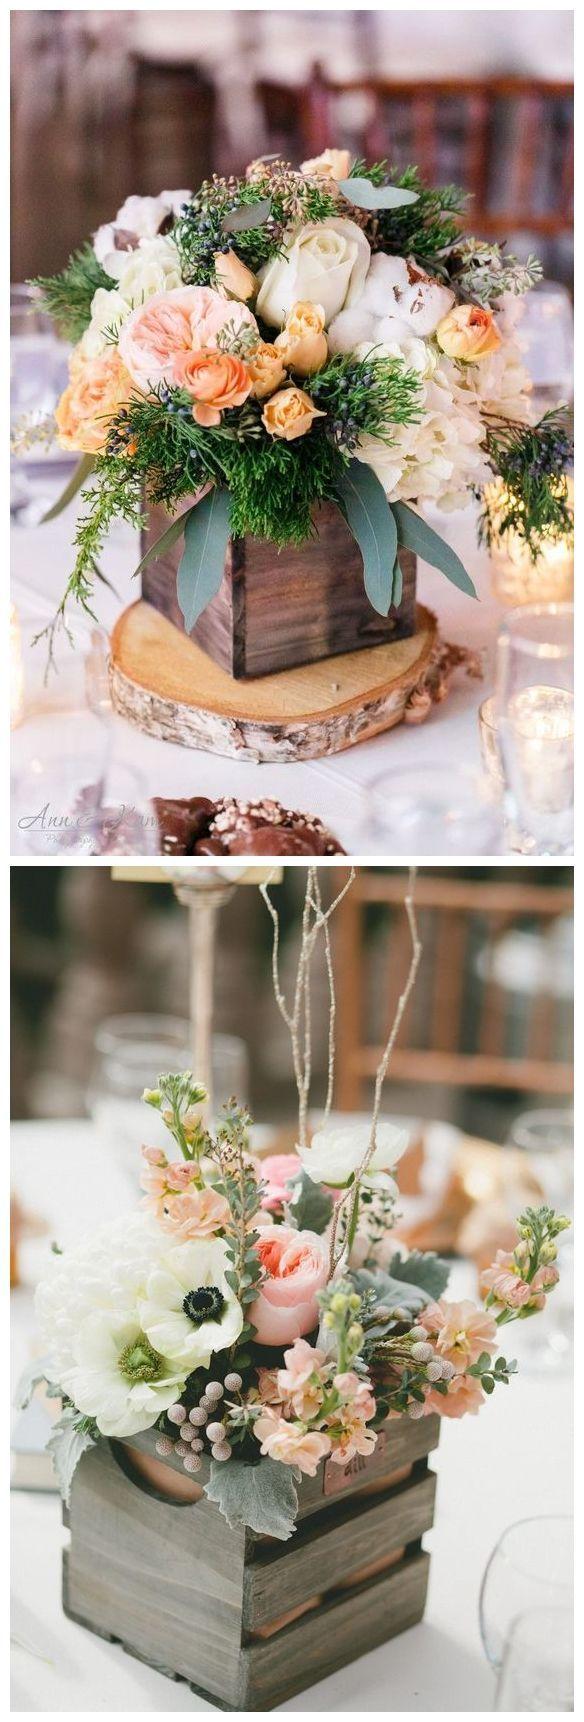 Rustic Woodsy Wedding Trend 2018 Wooden Crates Woodsy Wedding